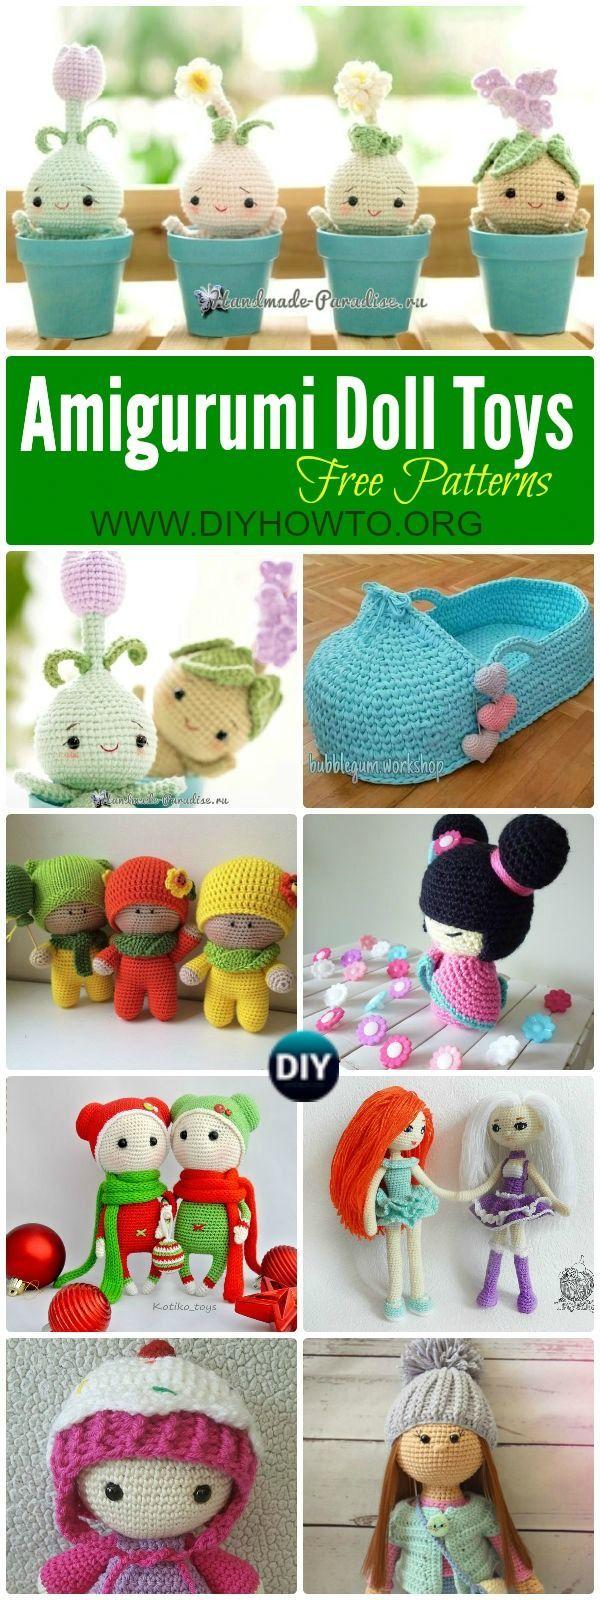 Crochet Doll Toys Free Patterns